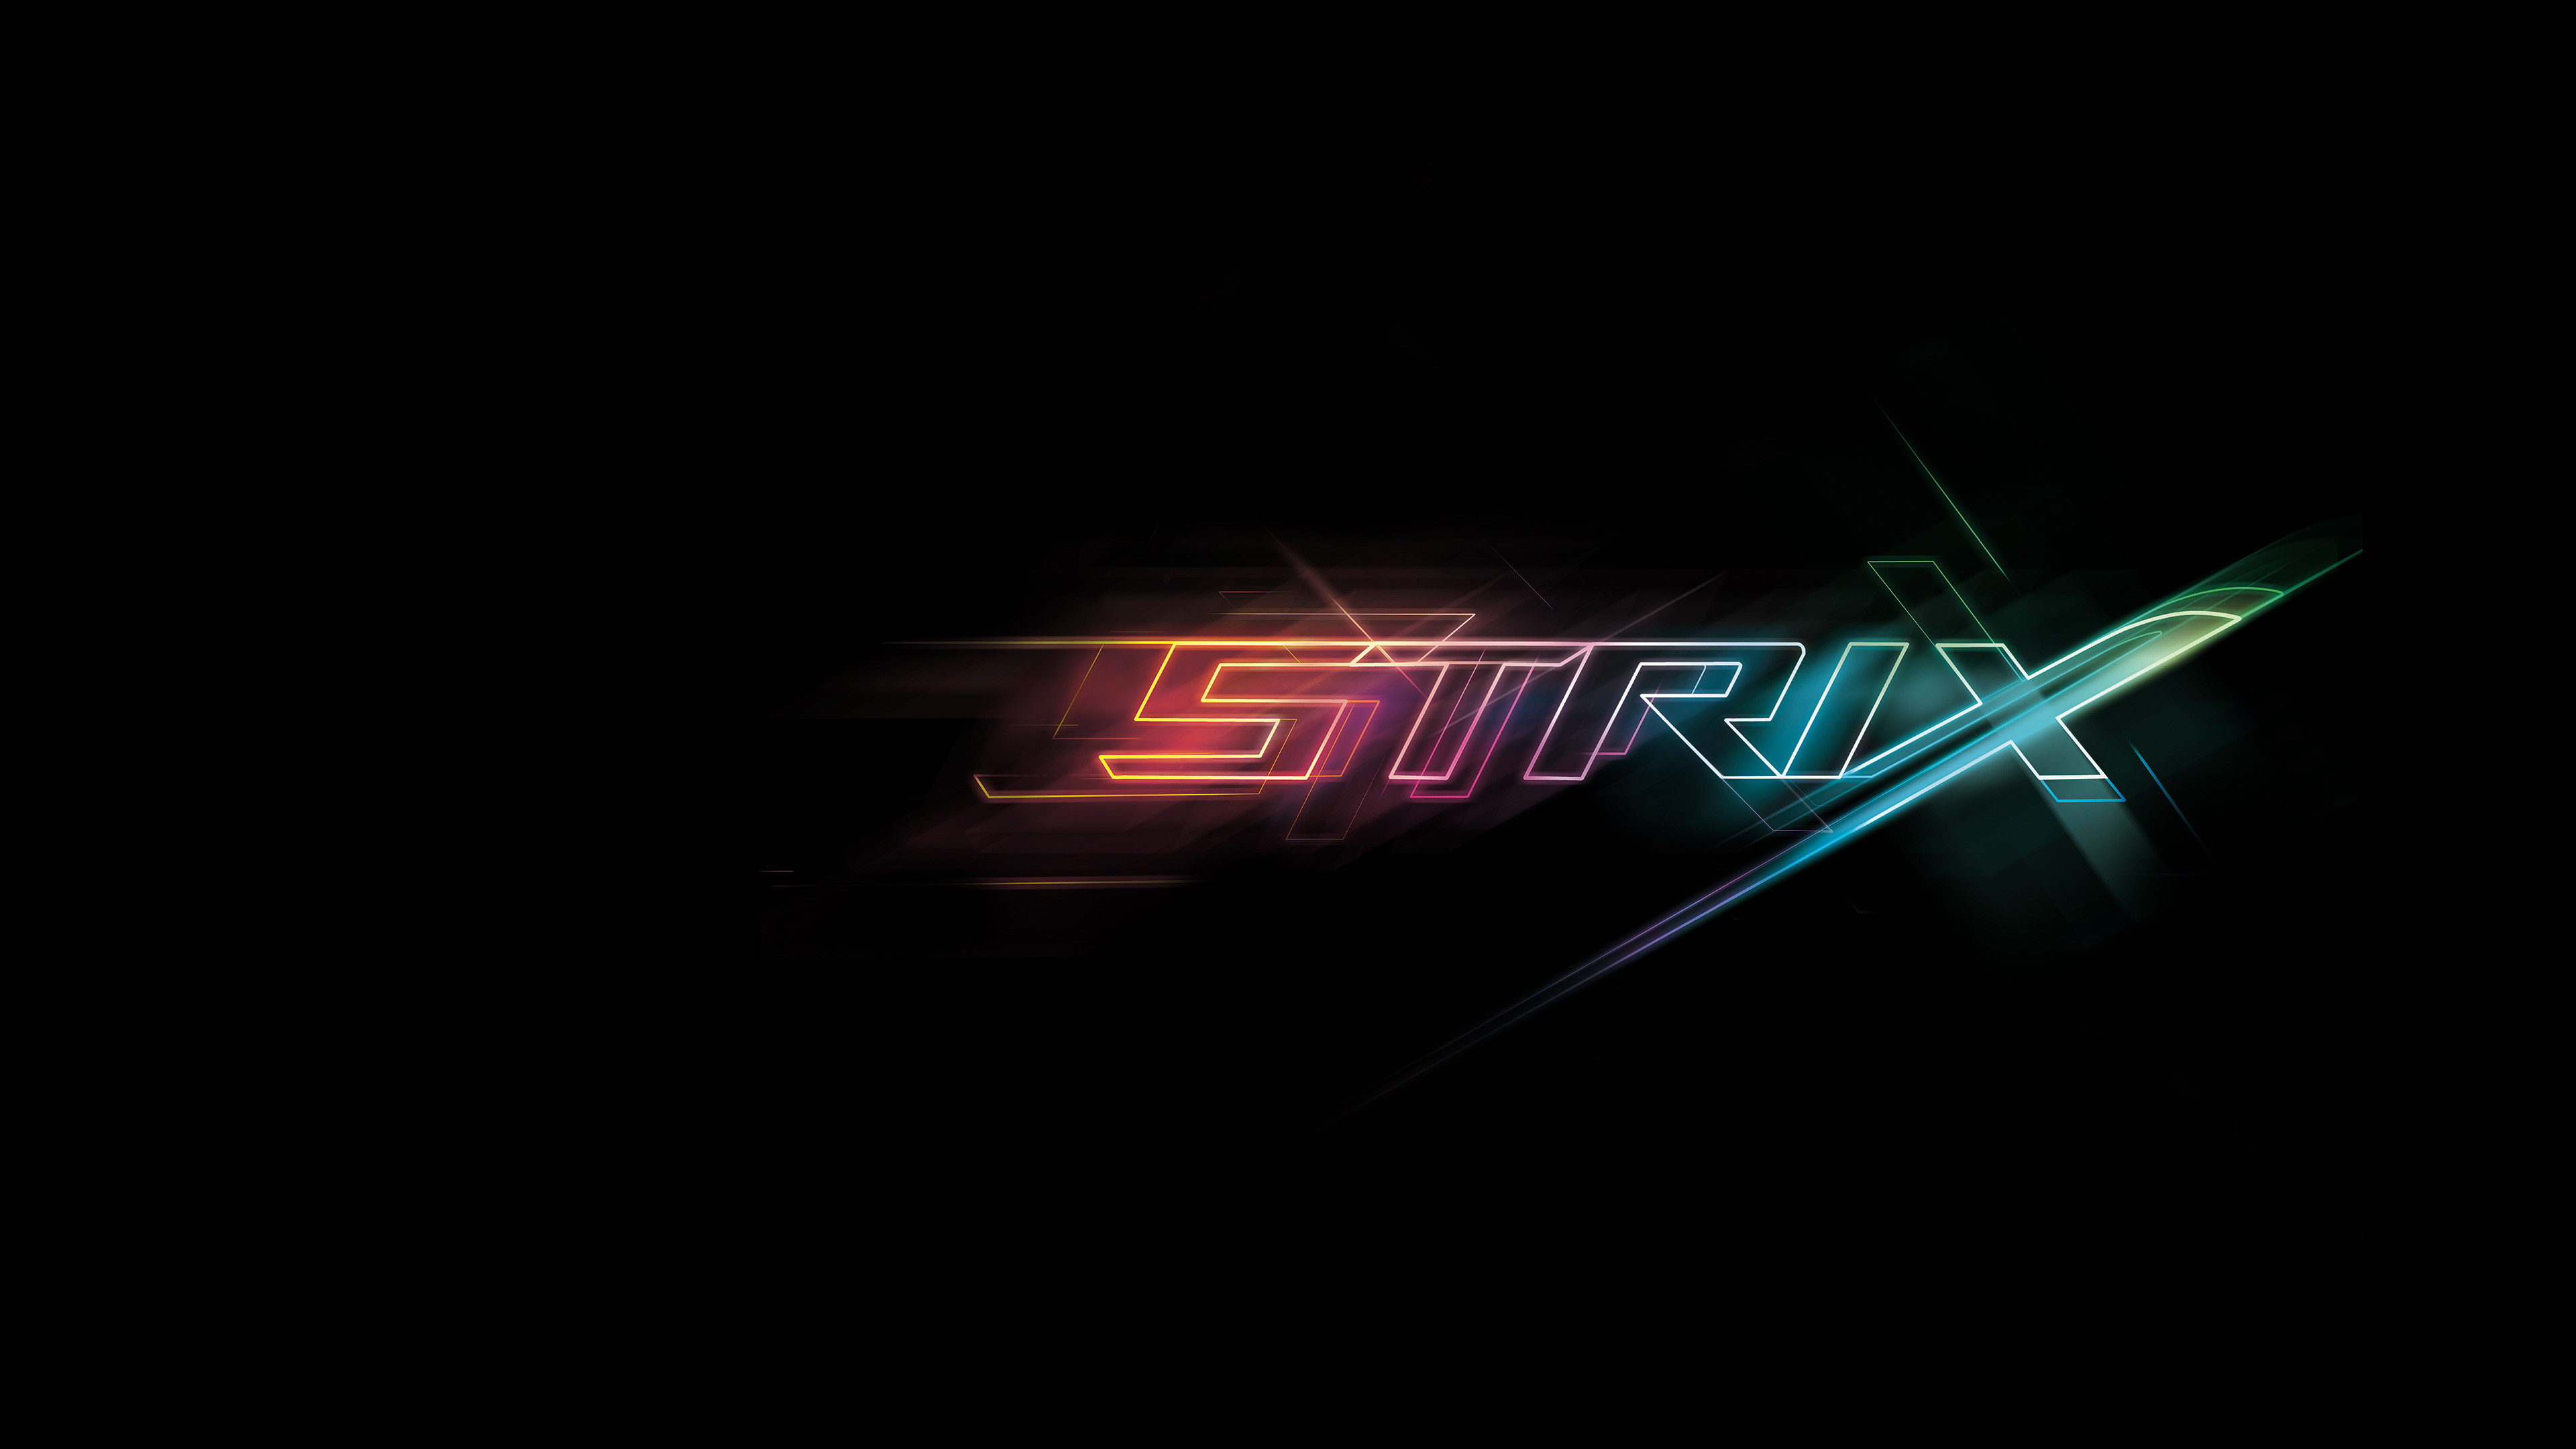 Asus Strix 4K Wallpaper